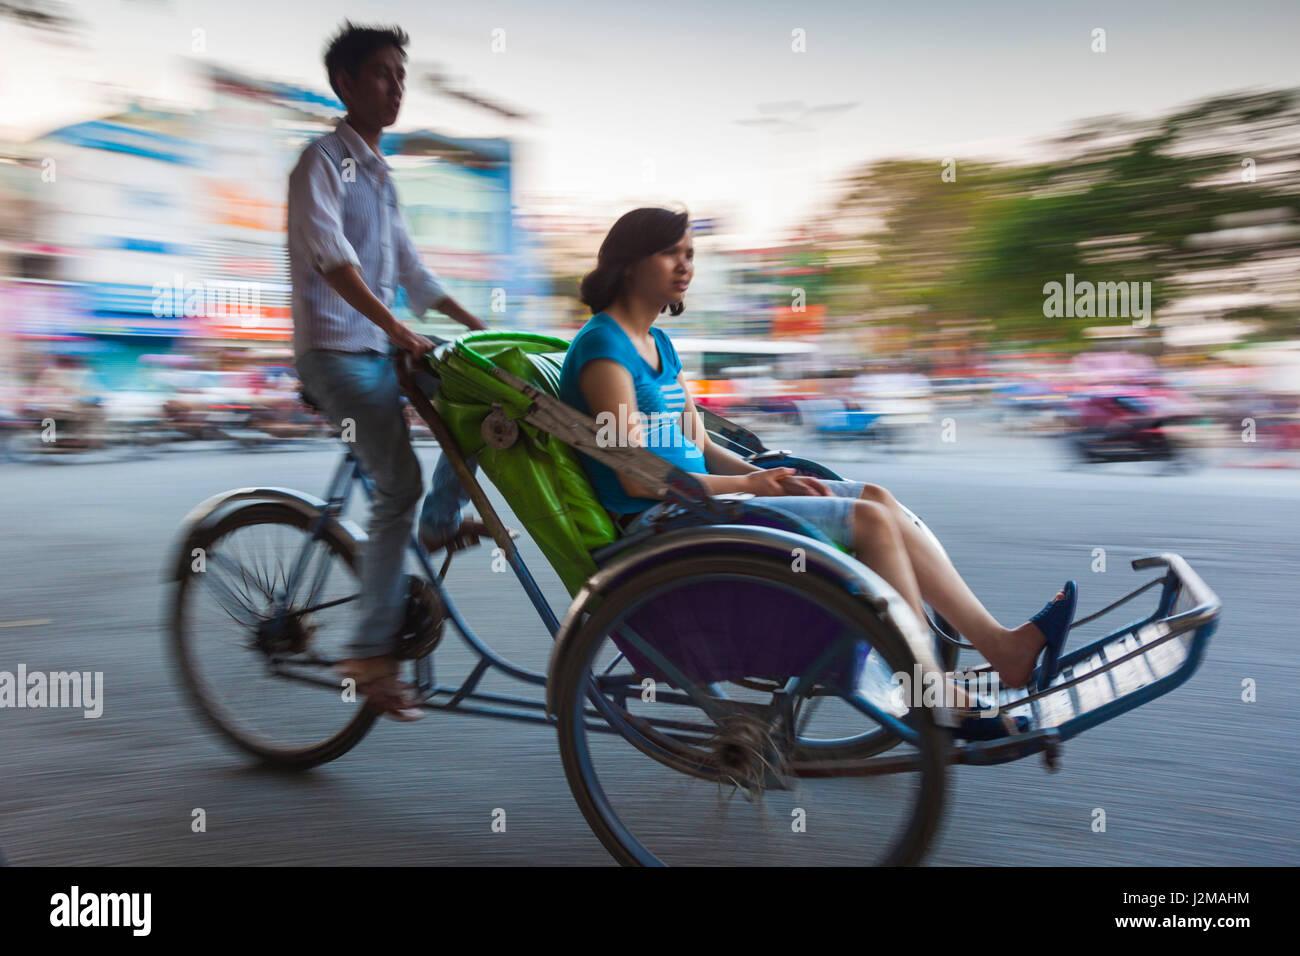 Vietnam, Hue, street traffic, cyclo, motion blur - Stock Image